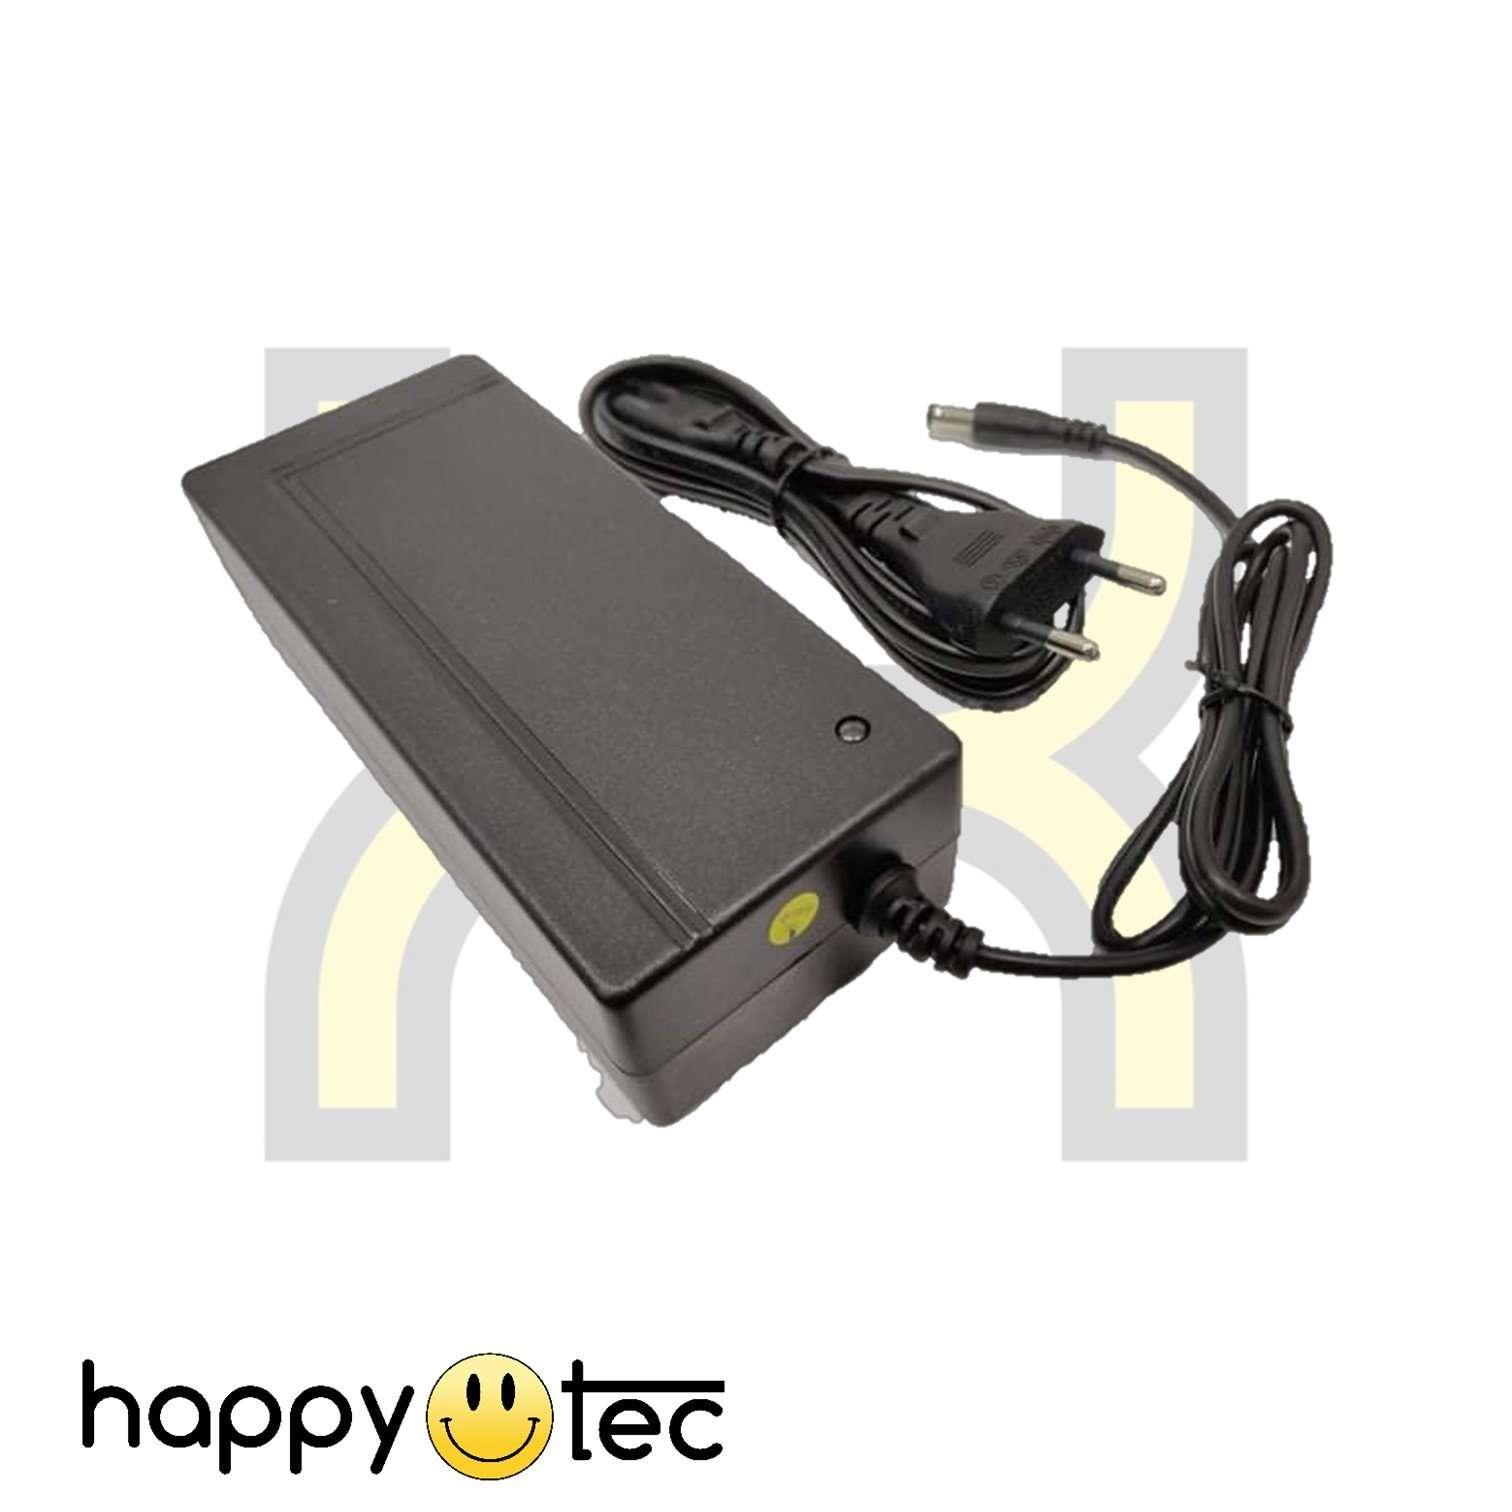 Caricabatterie originale per Lexgo R9 Lite / R9 Pro / R10